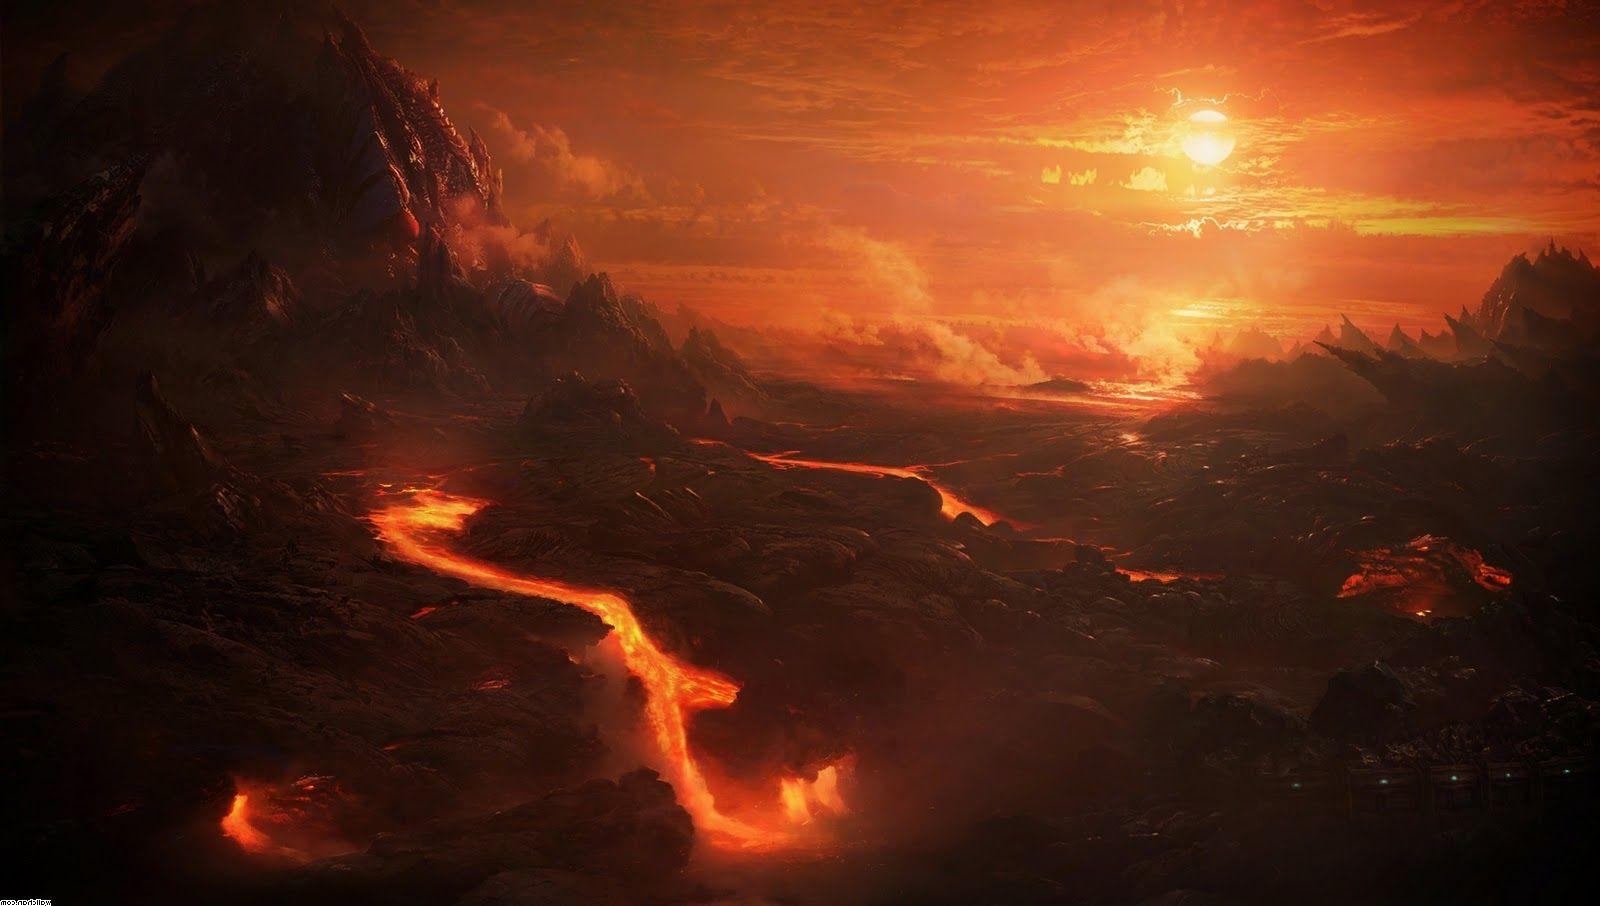 magma kökeni